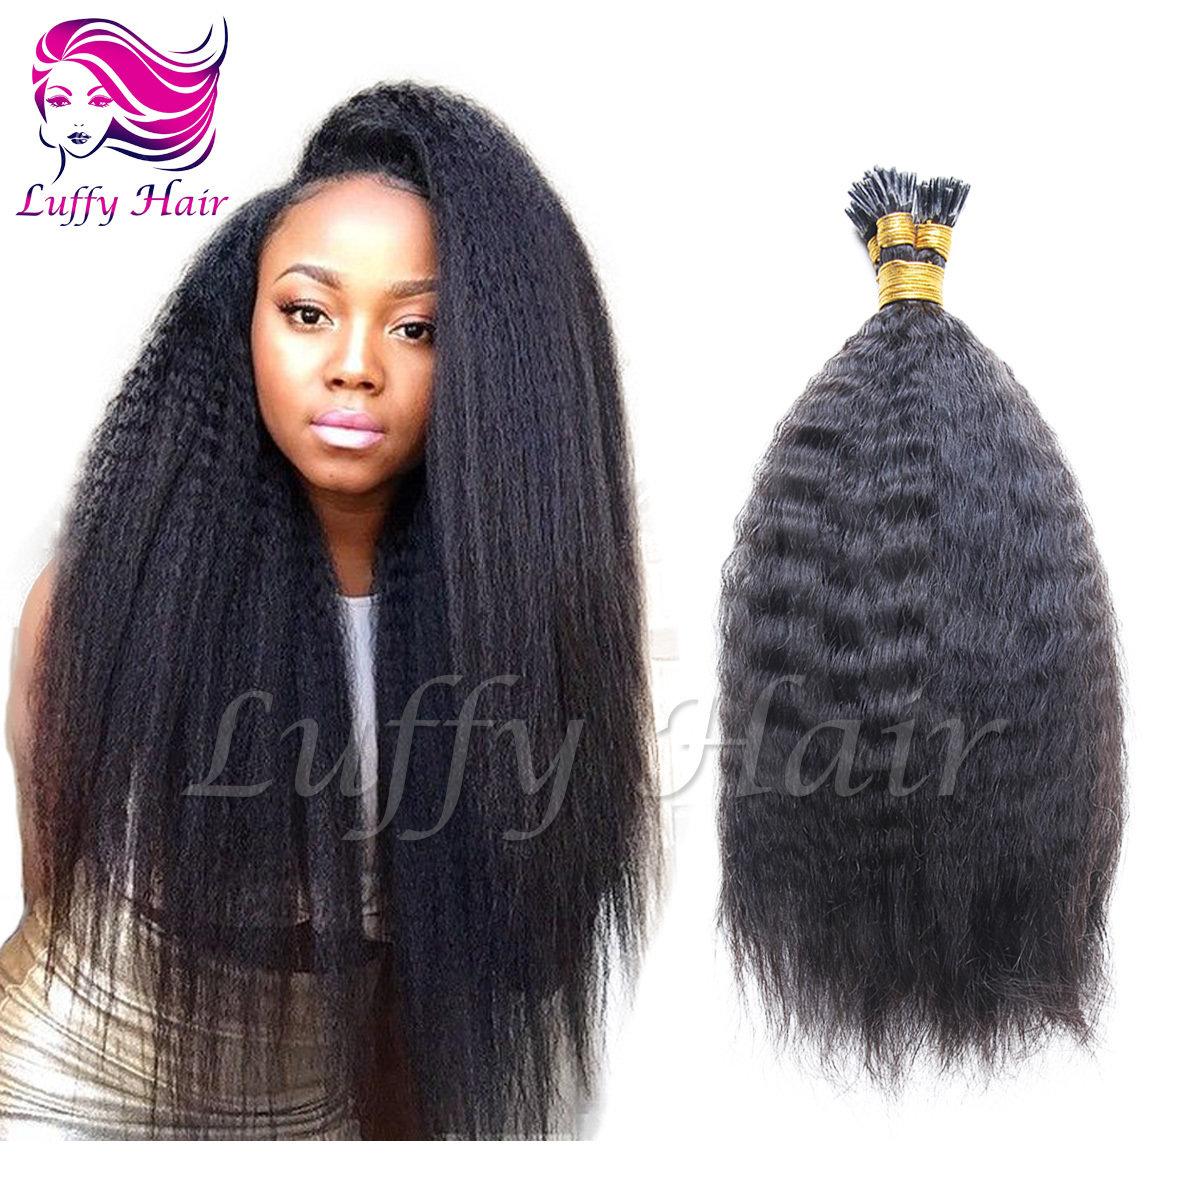 8A Virgin Human Hair Kinky Straight Fusion Hair Extensions - KFL009